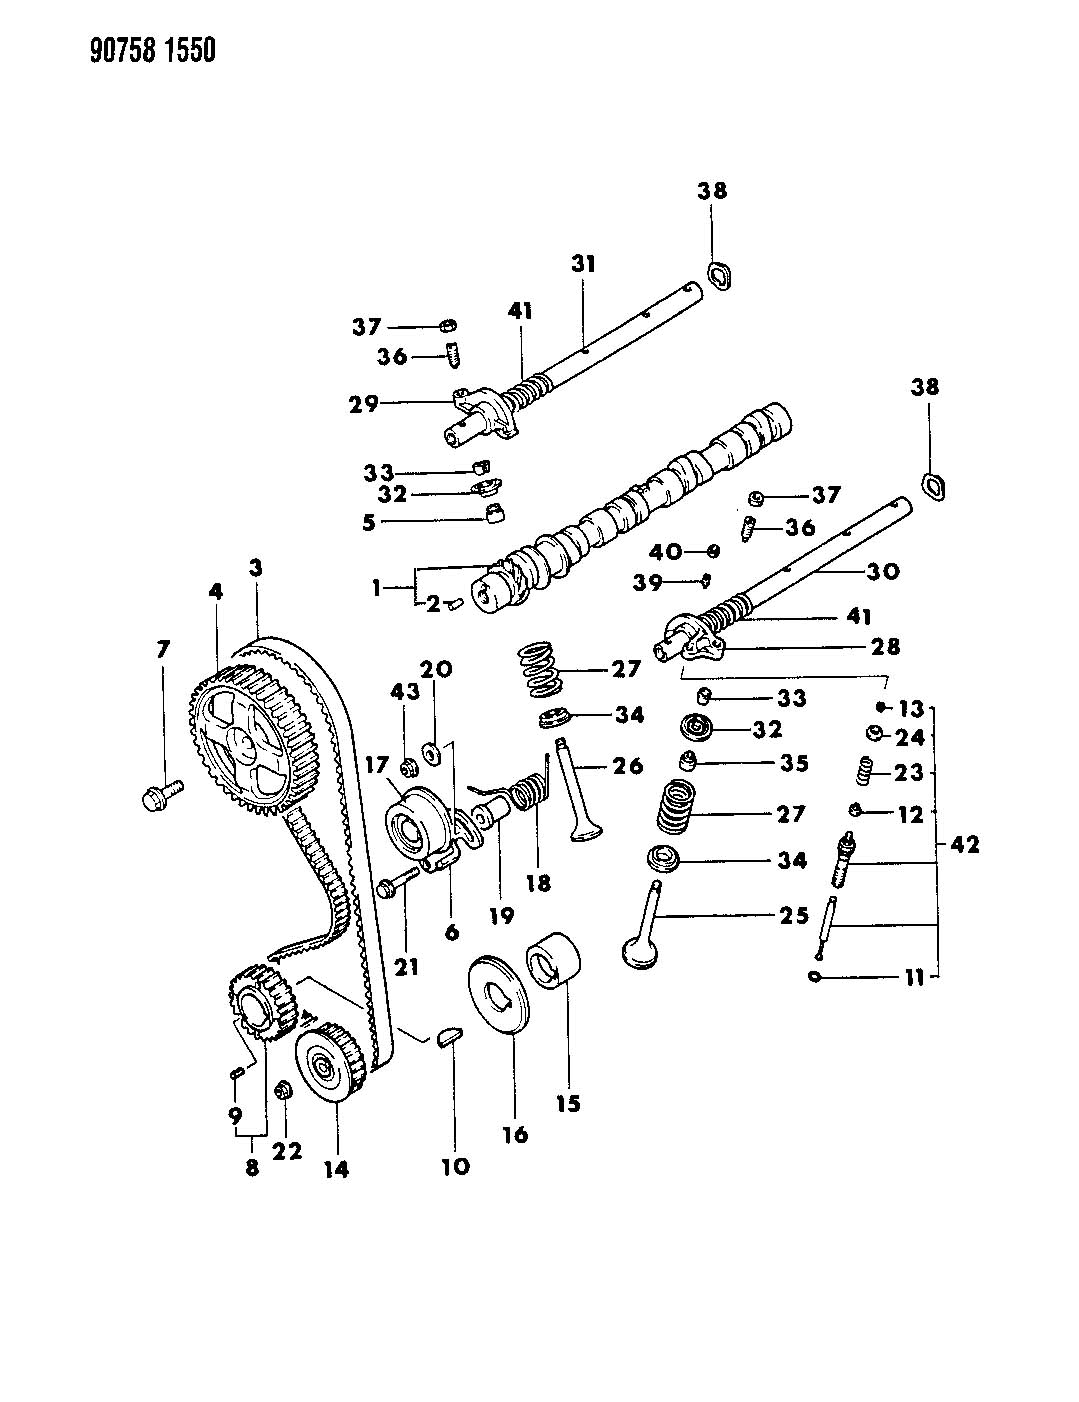 Chrysler Cirrus Nut. Hex flange. M8. Inlet manifold